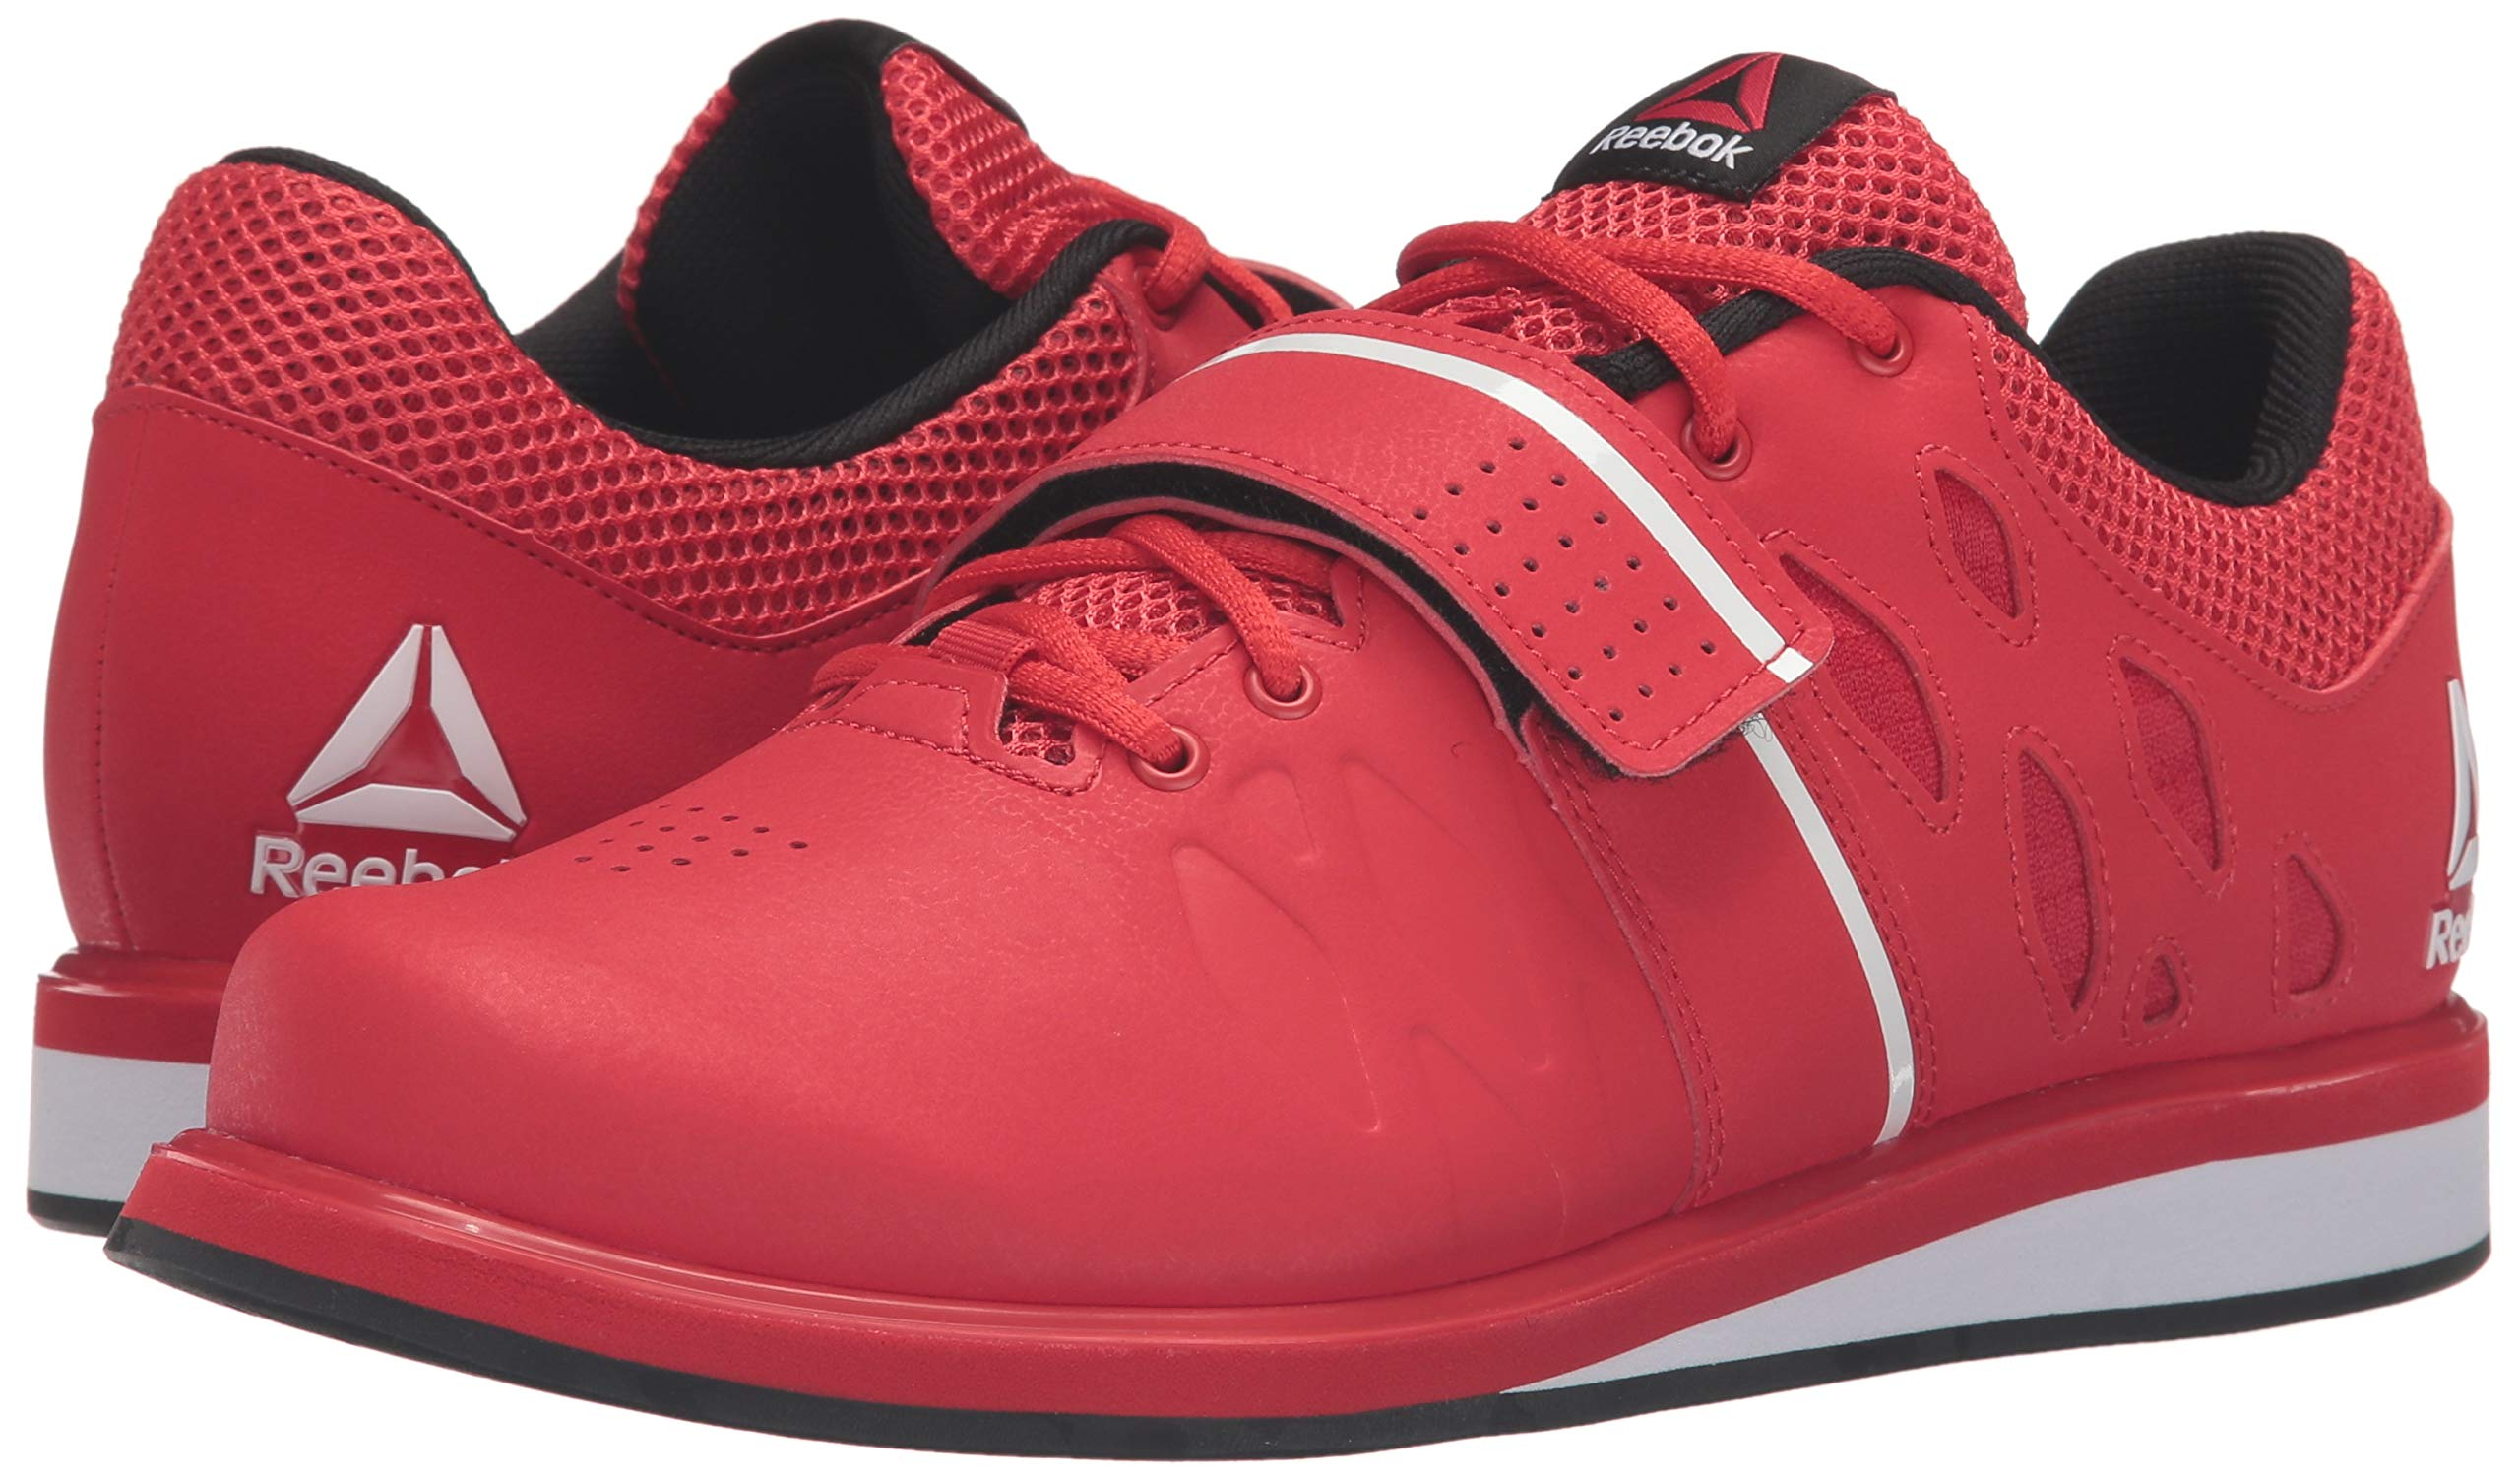 Reebok Men's Lifter Pr Cross-Trainer Shoe, Primal Red/Black/White, 7.5 M US by Reebok (Image #6)